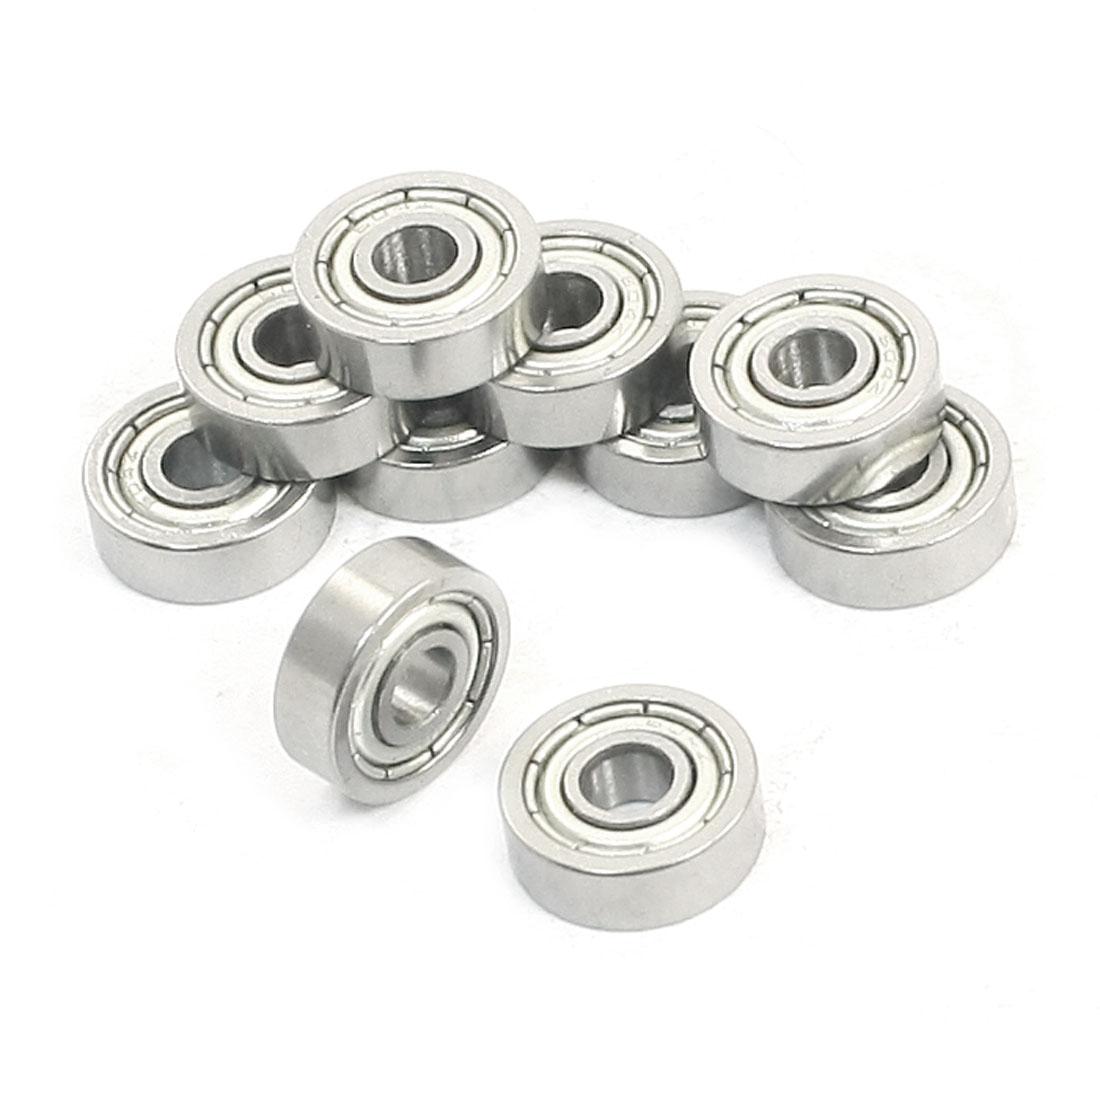 10 Pcs 4 x 12 x 4mm Double Shield Deep Groove Ball Bearings 604Z